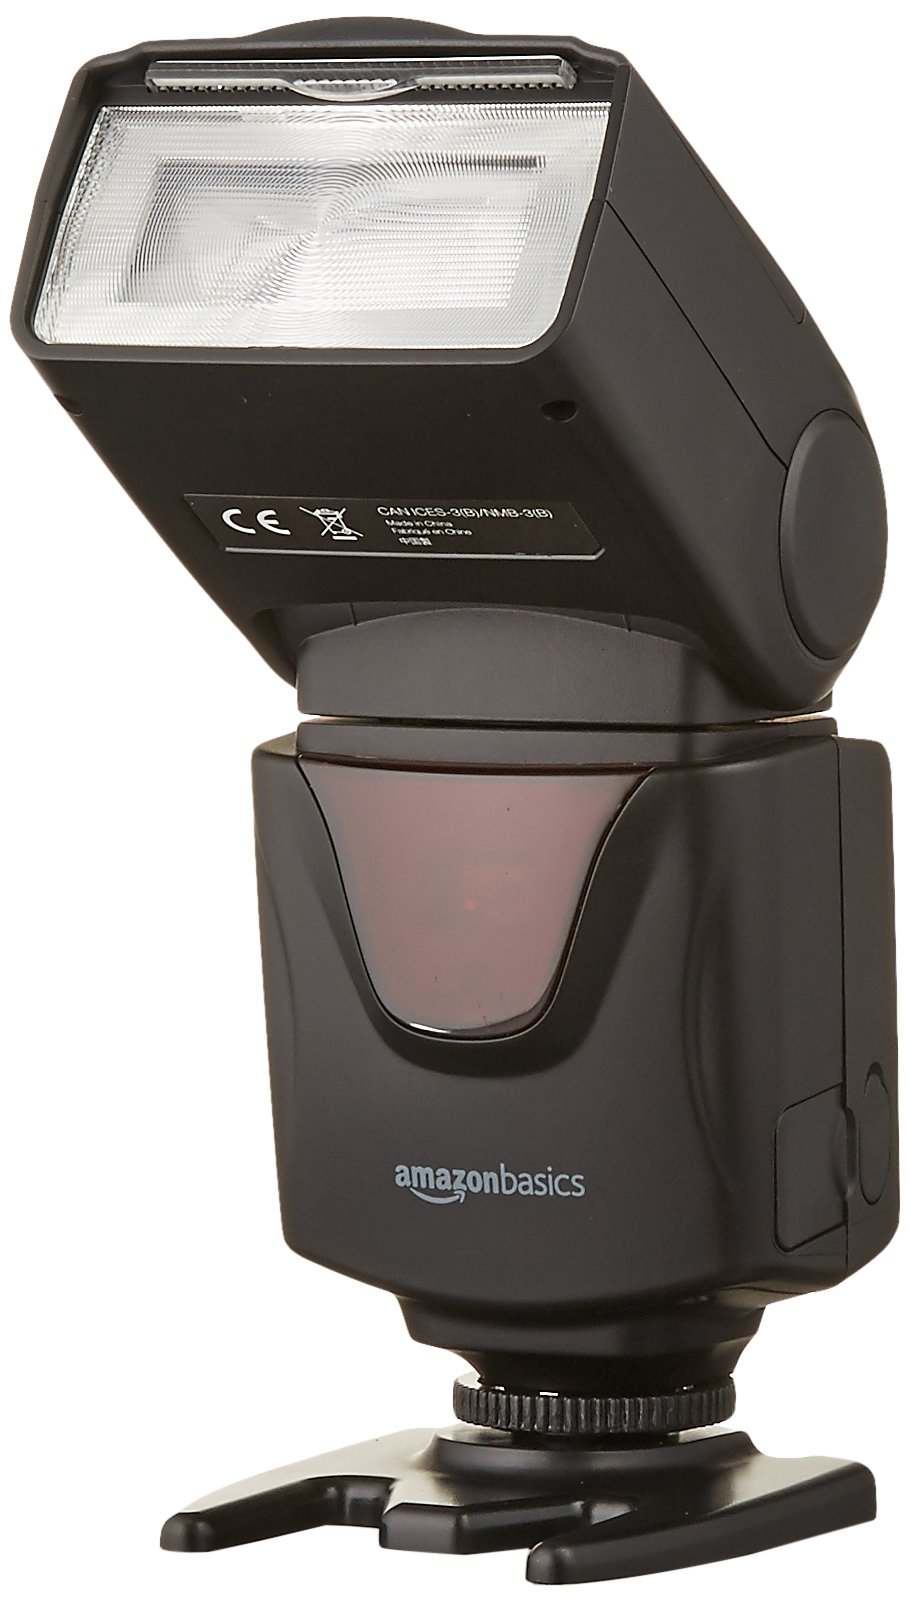 AmazonBasics Electronic Flash for DSLR Cameras (Canon, Nikon) by AmazonBasics